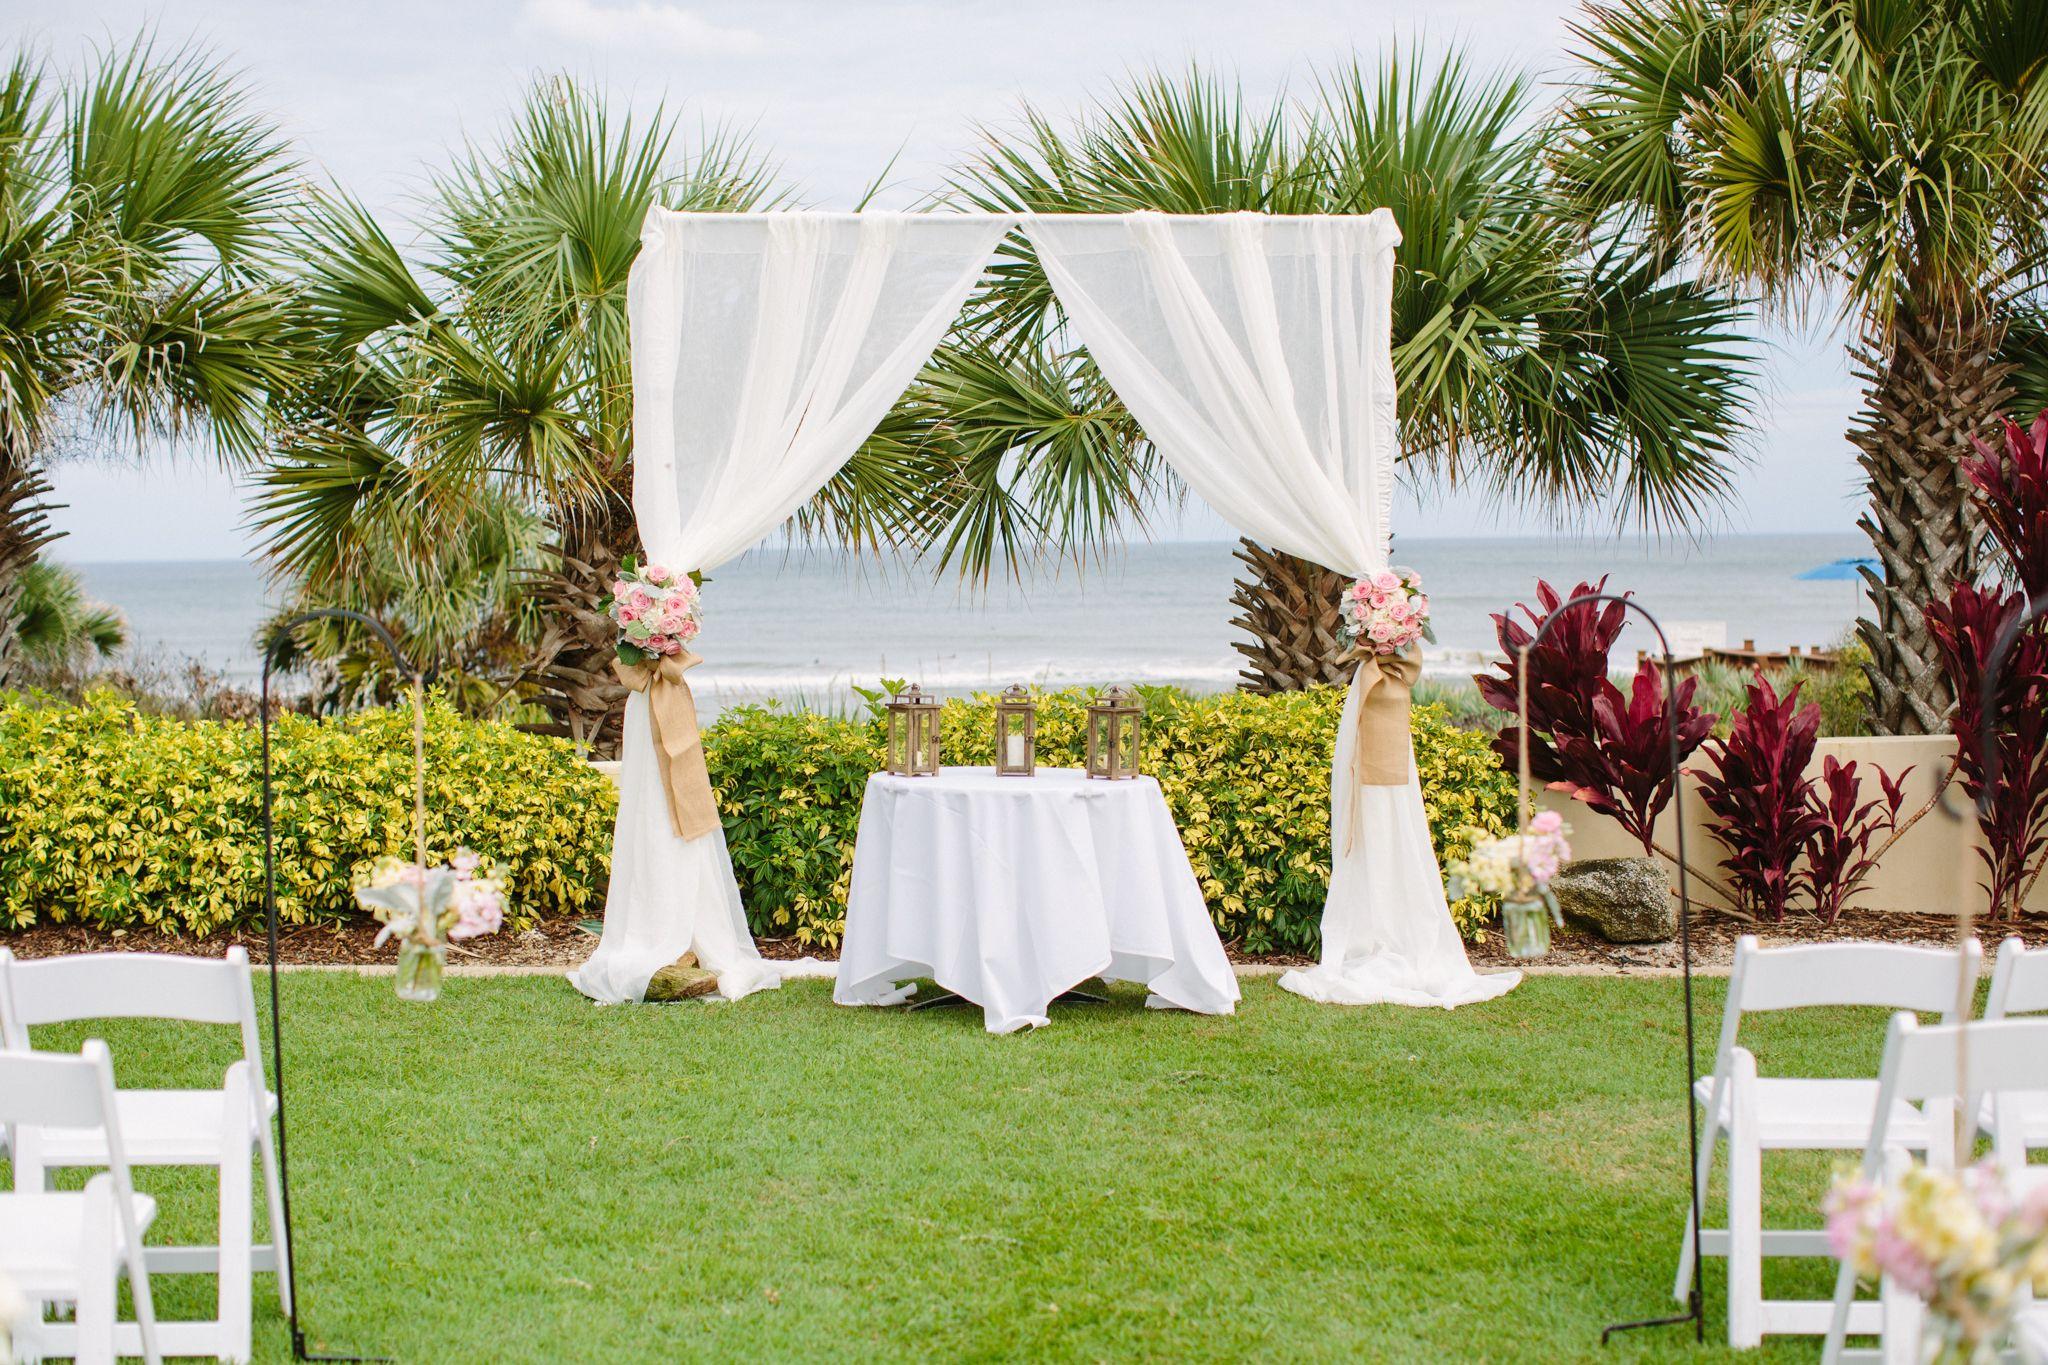 november wedding on lodge event lawn at hammock beach resort palm